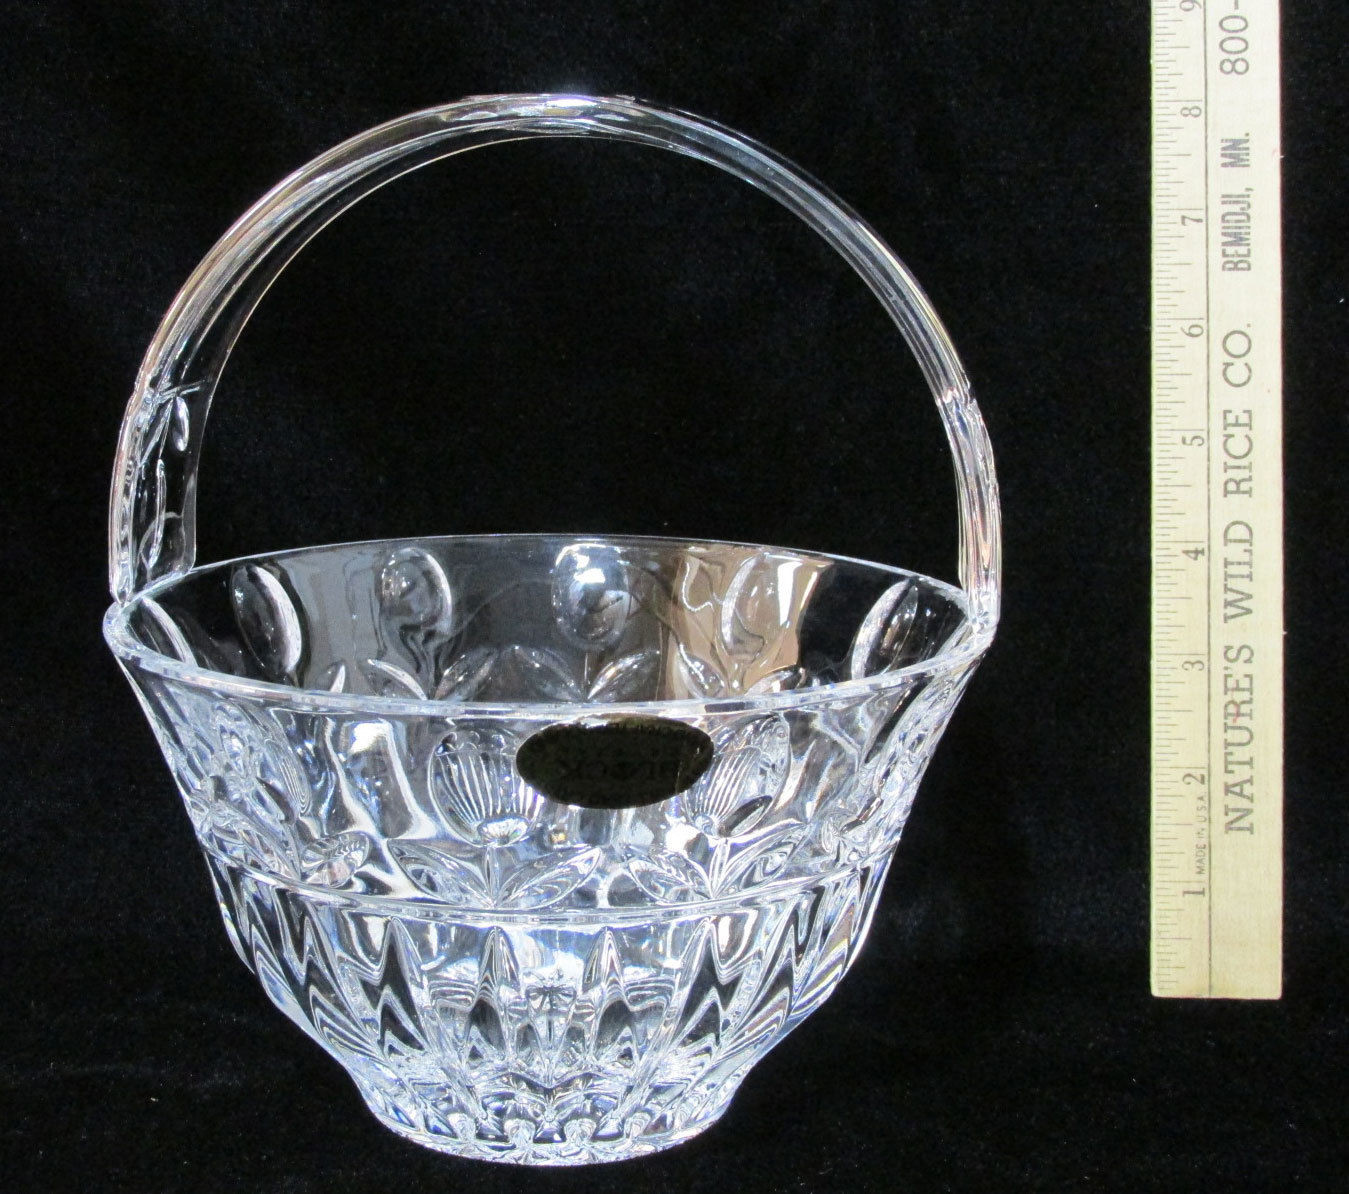 rcr crystal vase price of block crystal tulip garden handled basket y3916 ebay with norton secured powered by verisign